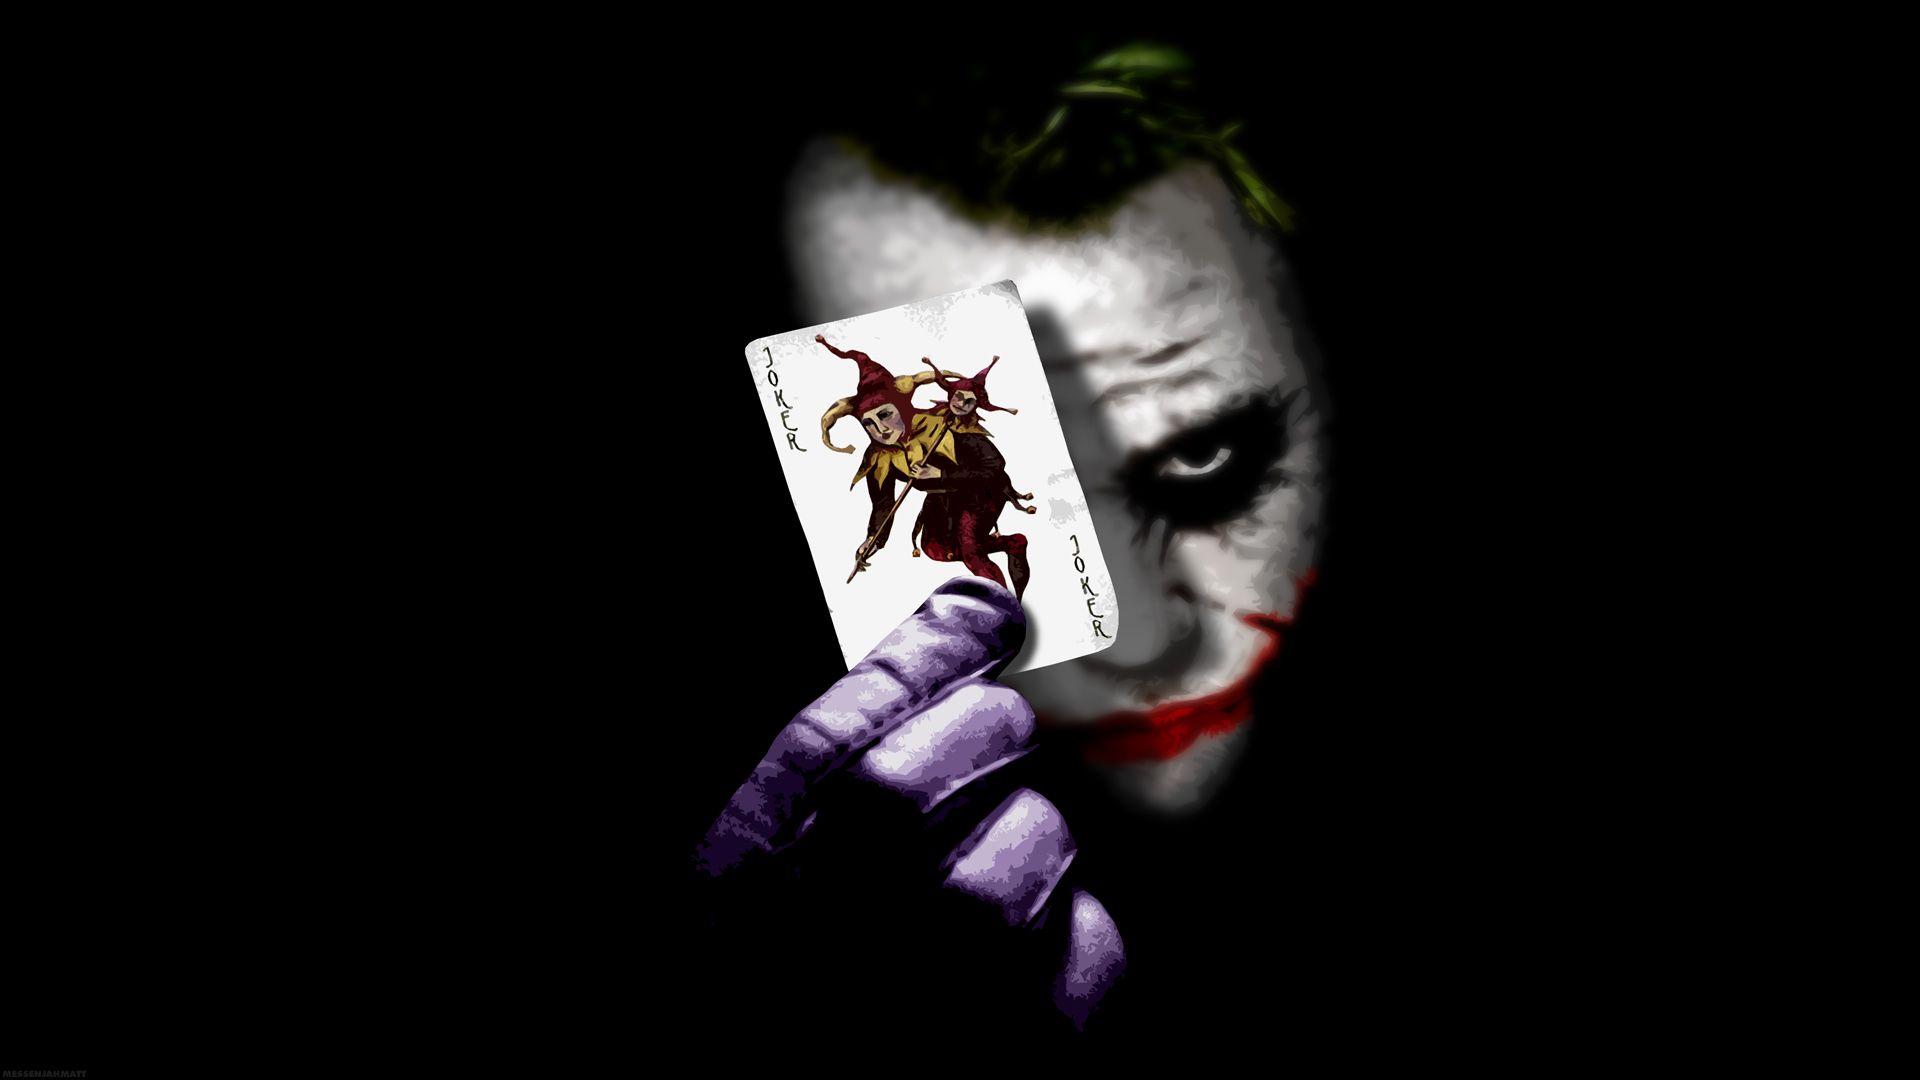 The Joker Kecantikan Full Hd Taringa Balamuda With Images